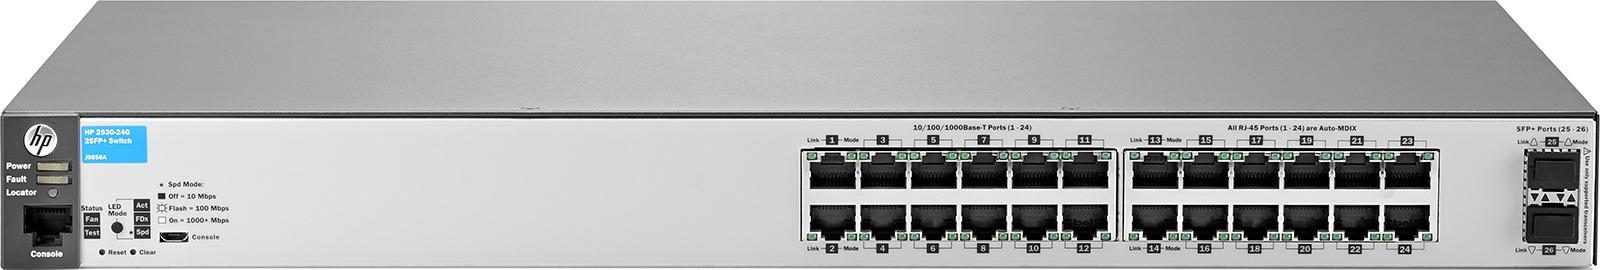 Коммутатор HPE 2530-24G-2SFP+, управляемый, J9856A коммутатор hpe 1820 24g poe управляемый j9983a